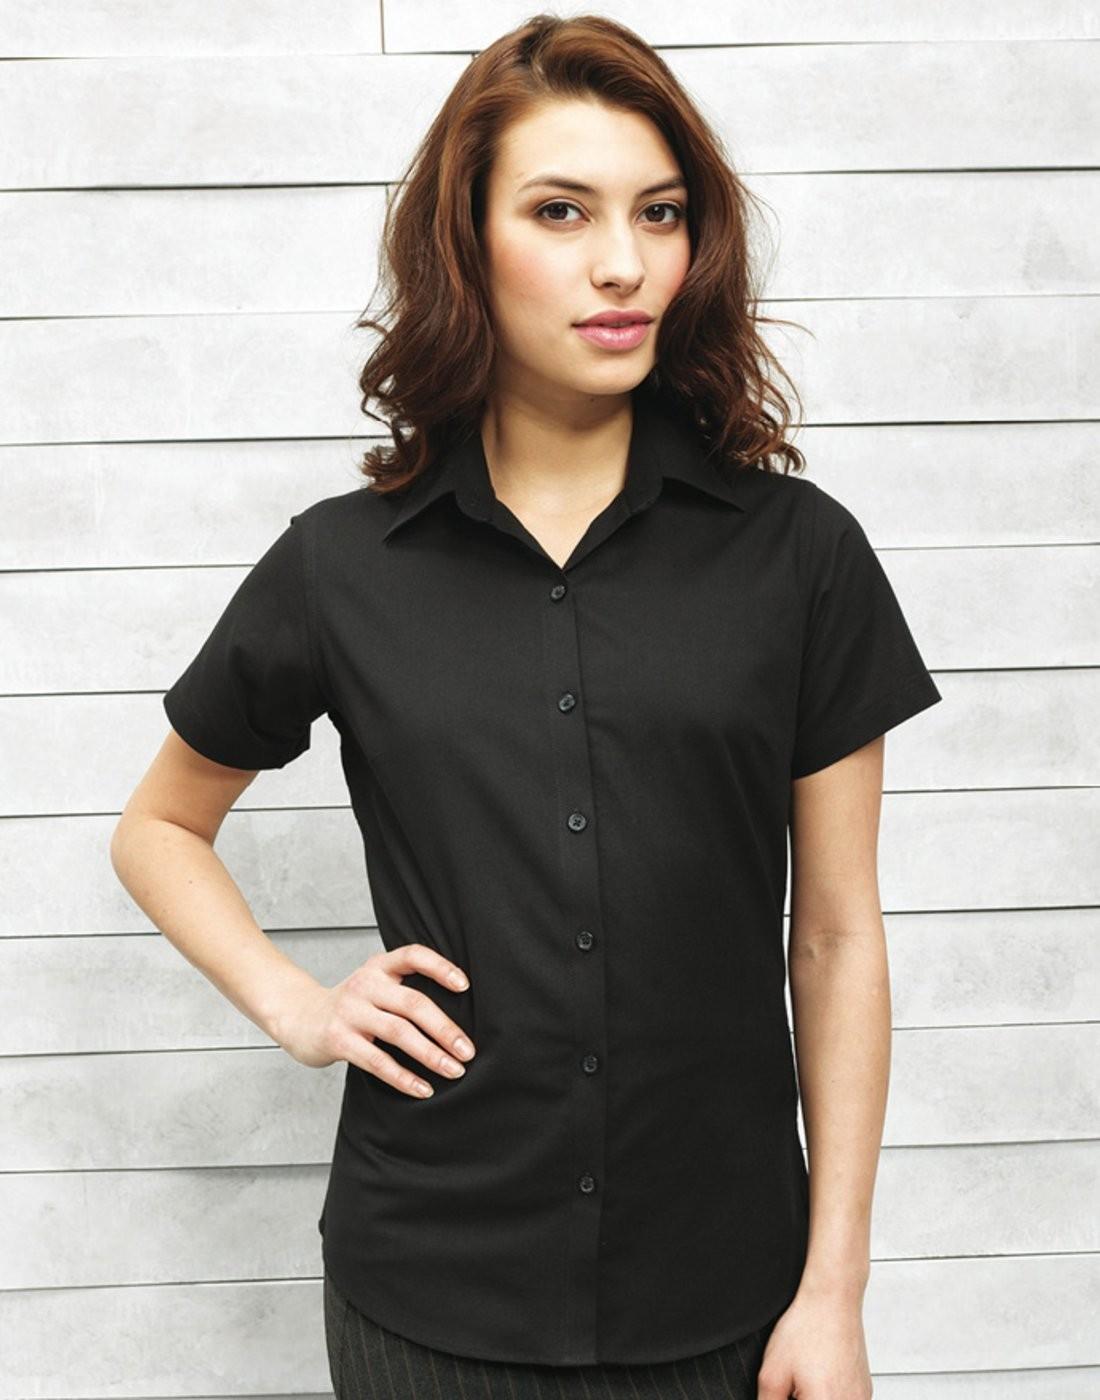 faa91f84827 Personalised Women s Signature Oxford Short Sleeve Shirt (PR336 ...